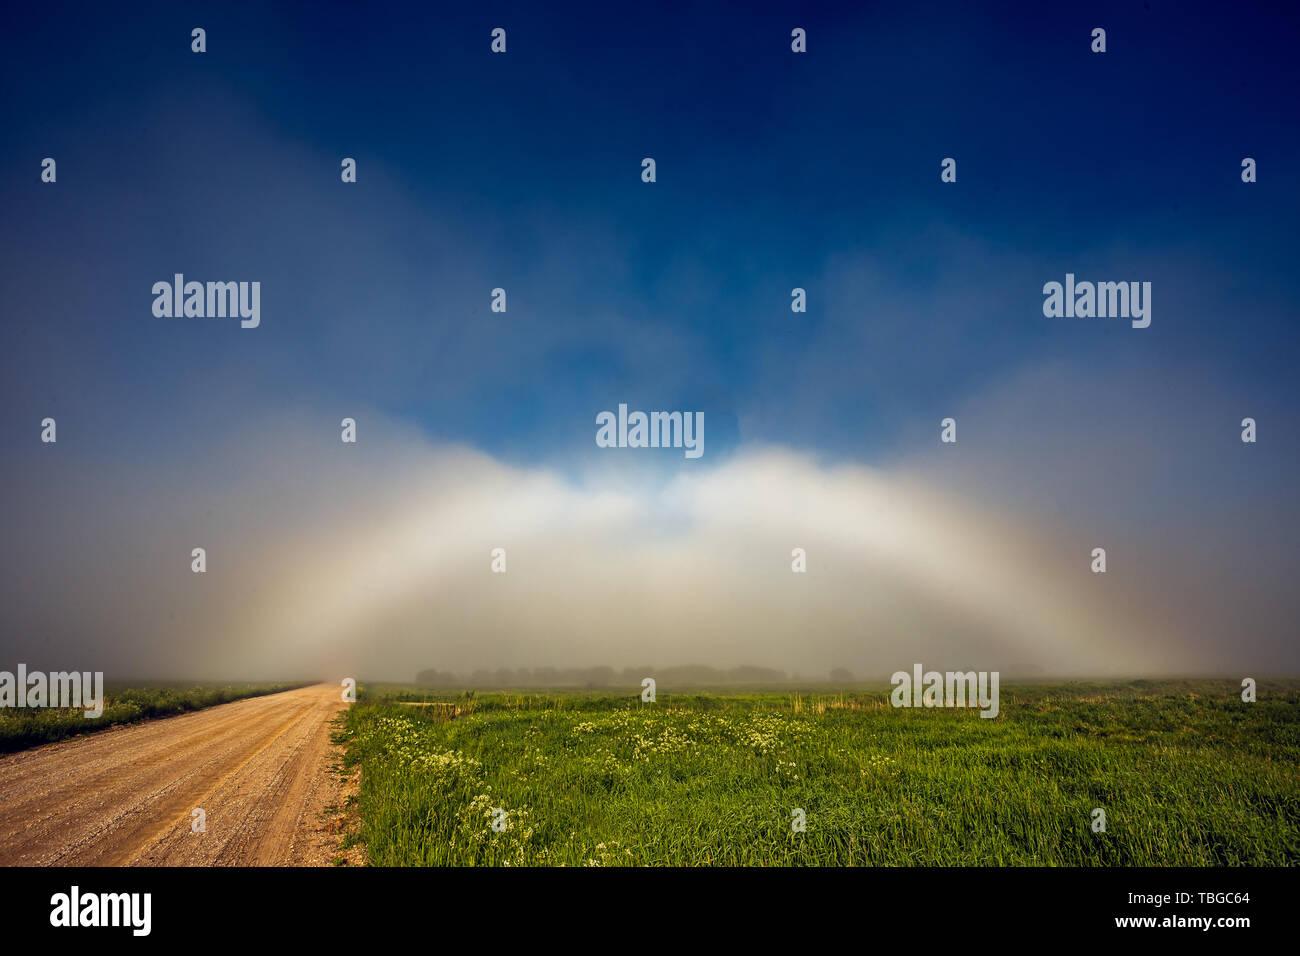 Rare White Rainbow Fogbow near the path - Stock Image